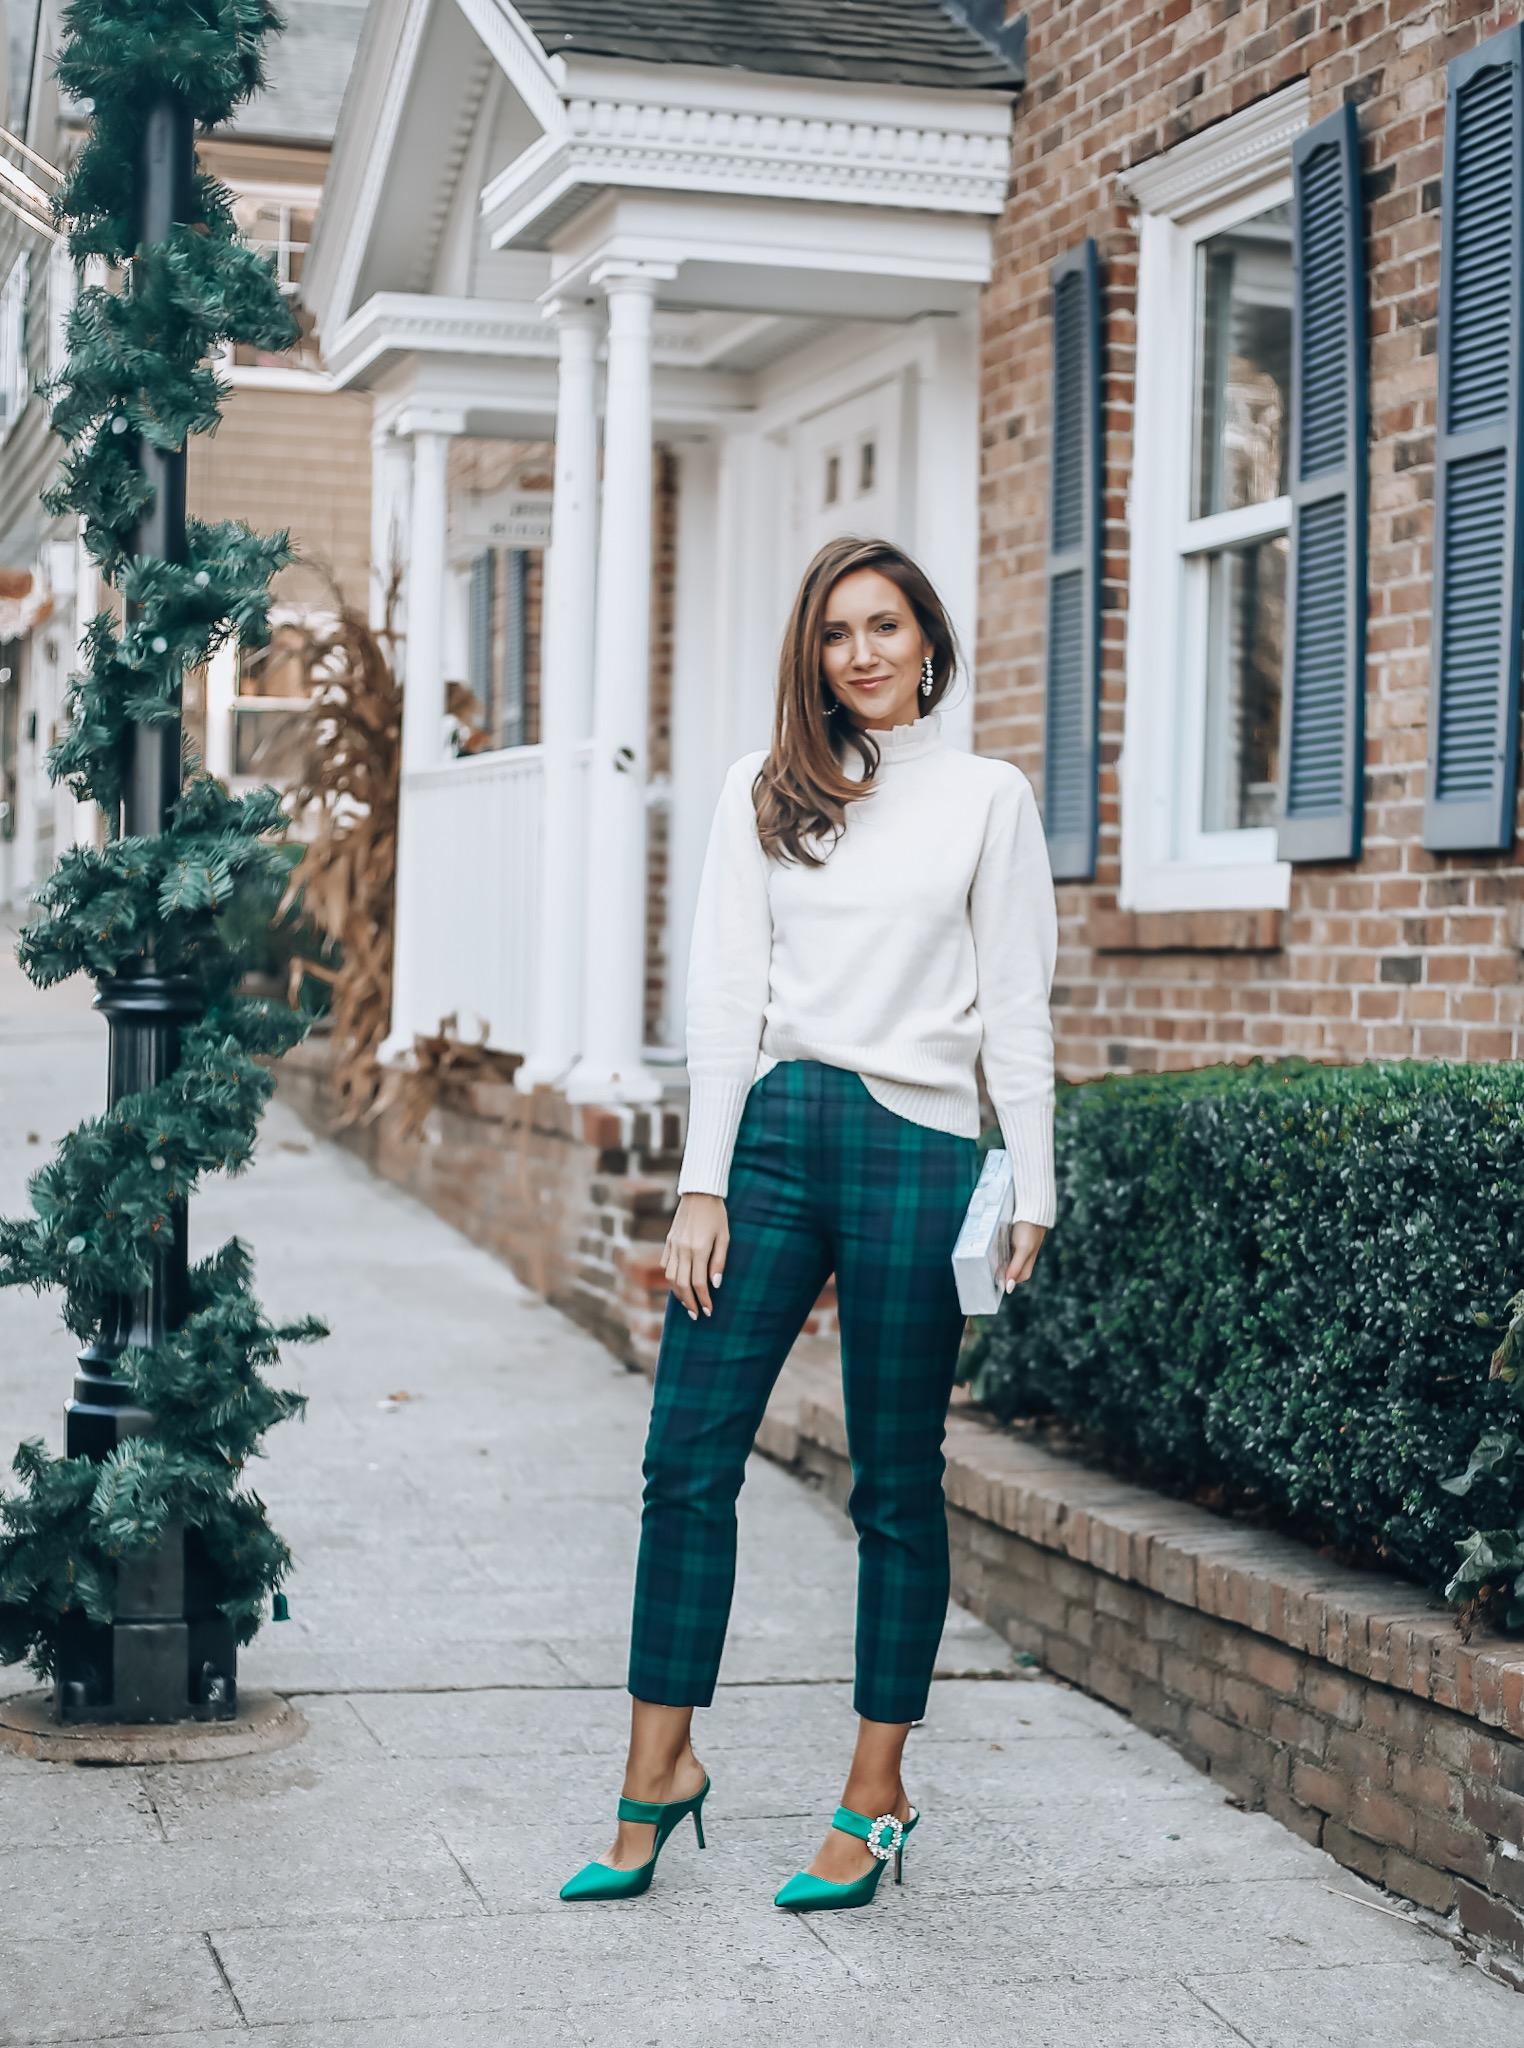 Sweater, Plaid Pants, Maryjane heels, J.Crew style